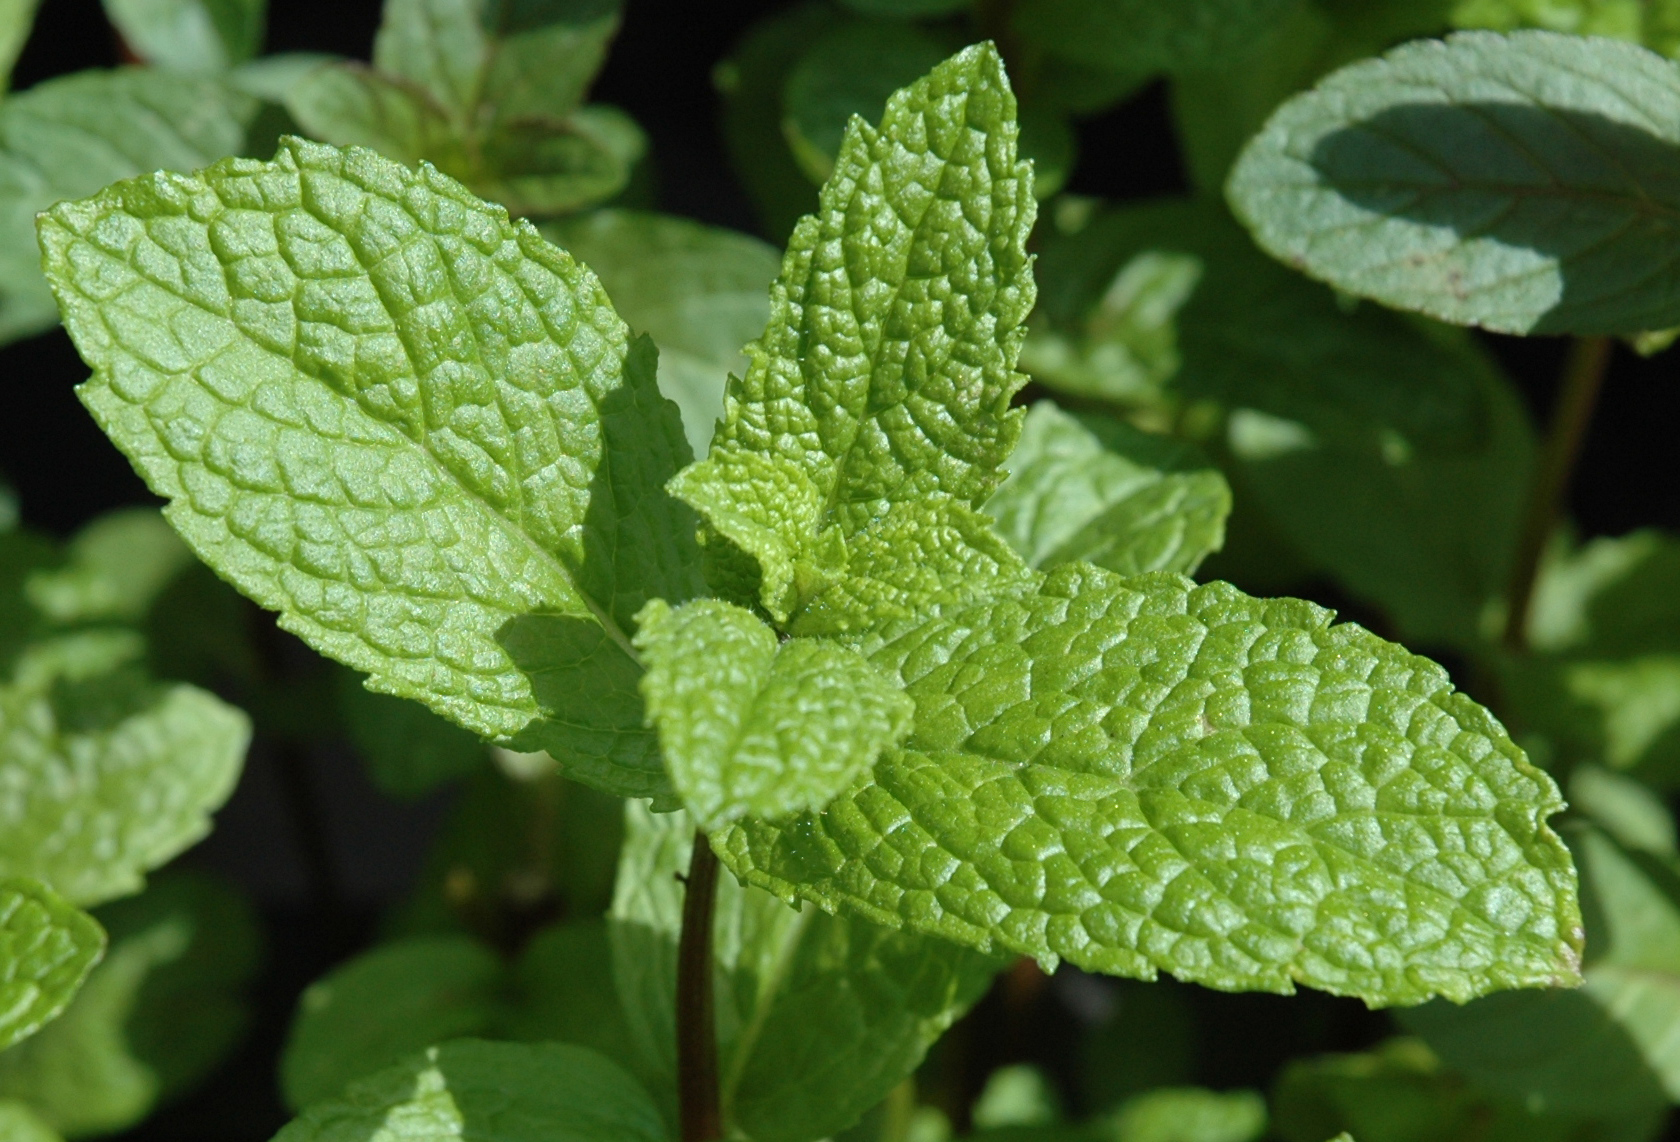 Leaves-of-Mint